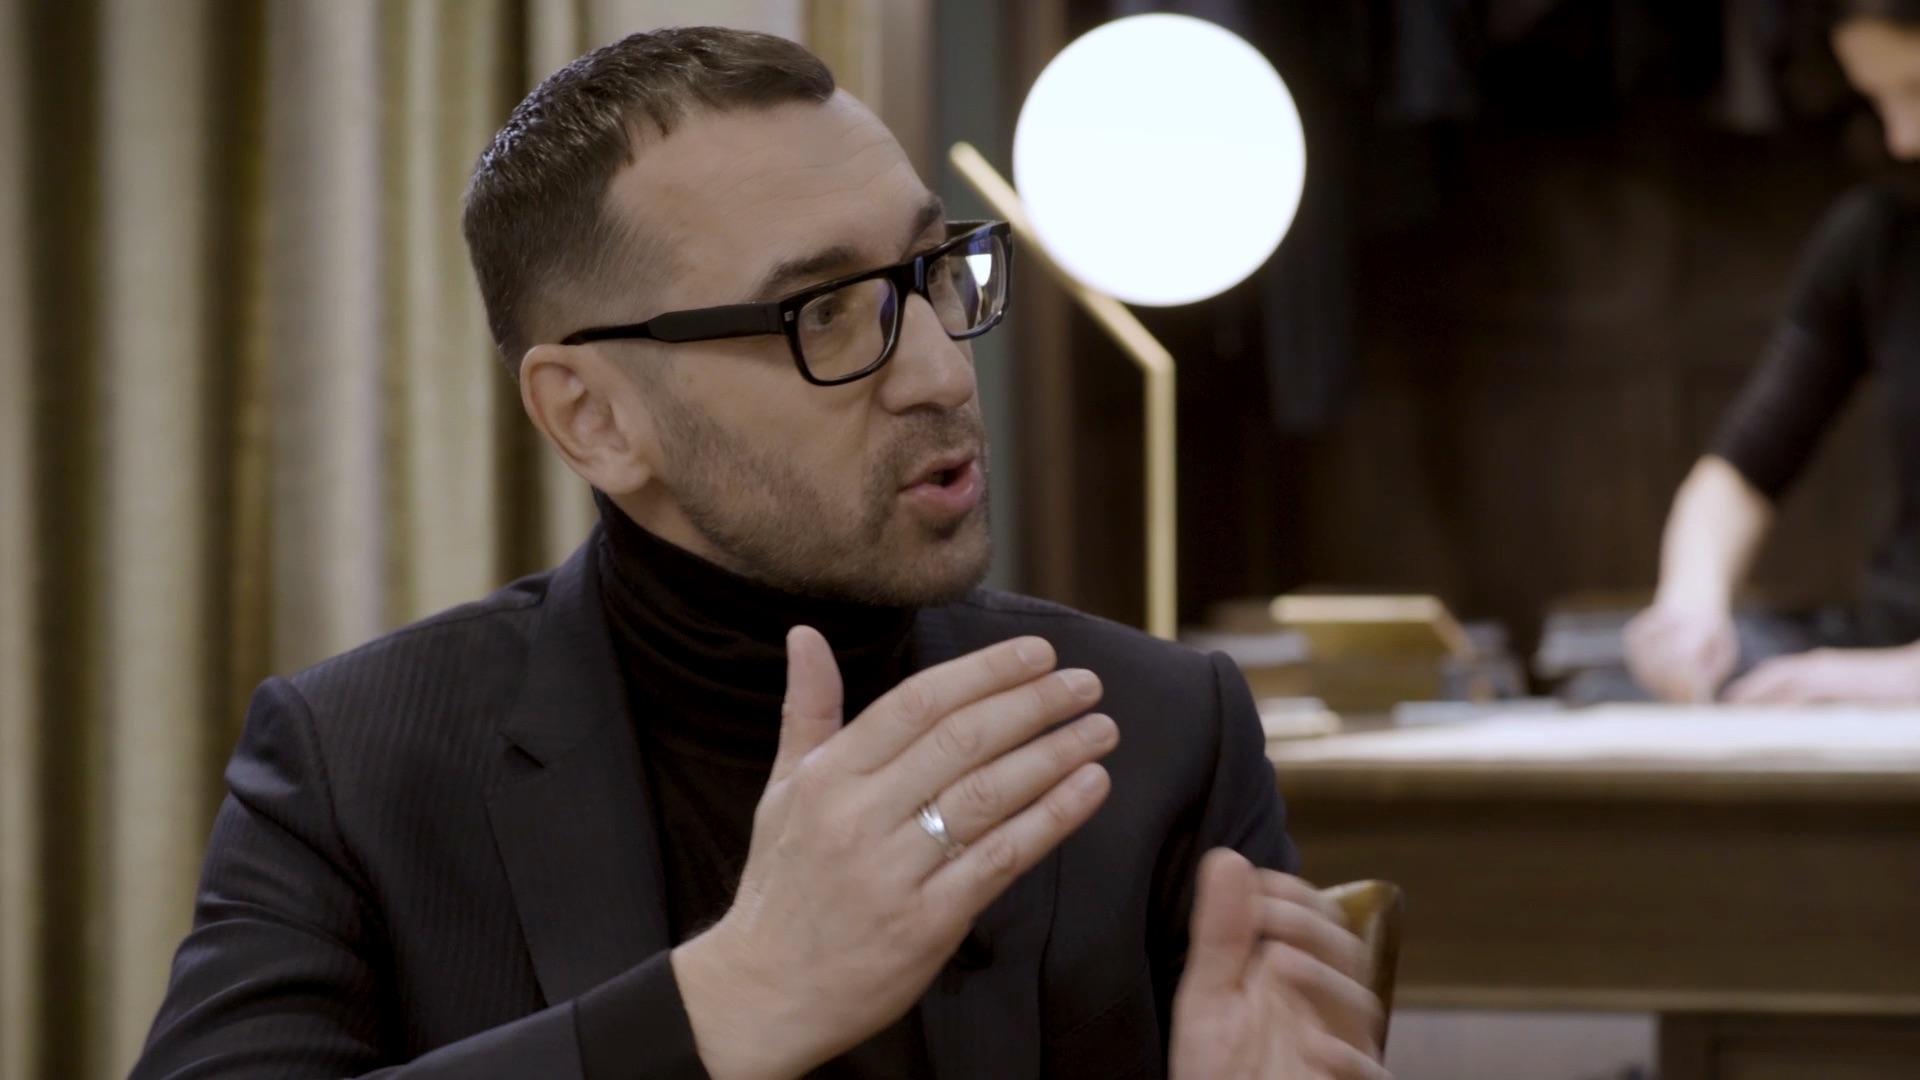 Sartorial Talks, Episode 10 : A discussion with Alessandro Sartori (part 2)